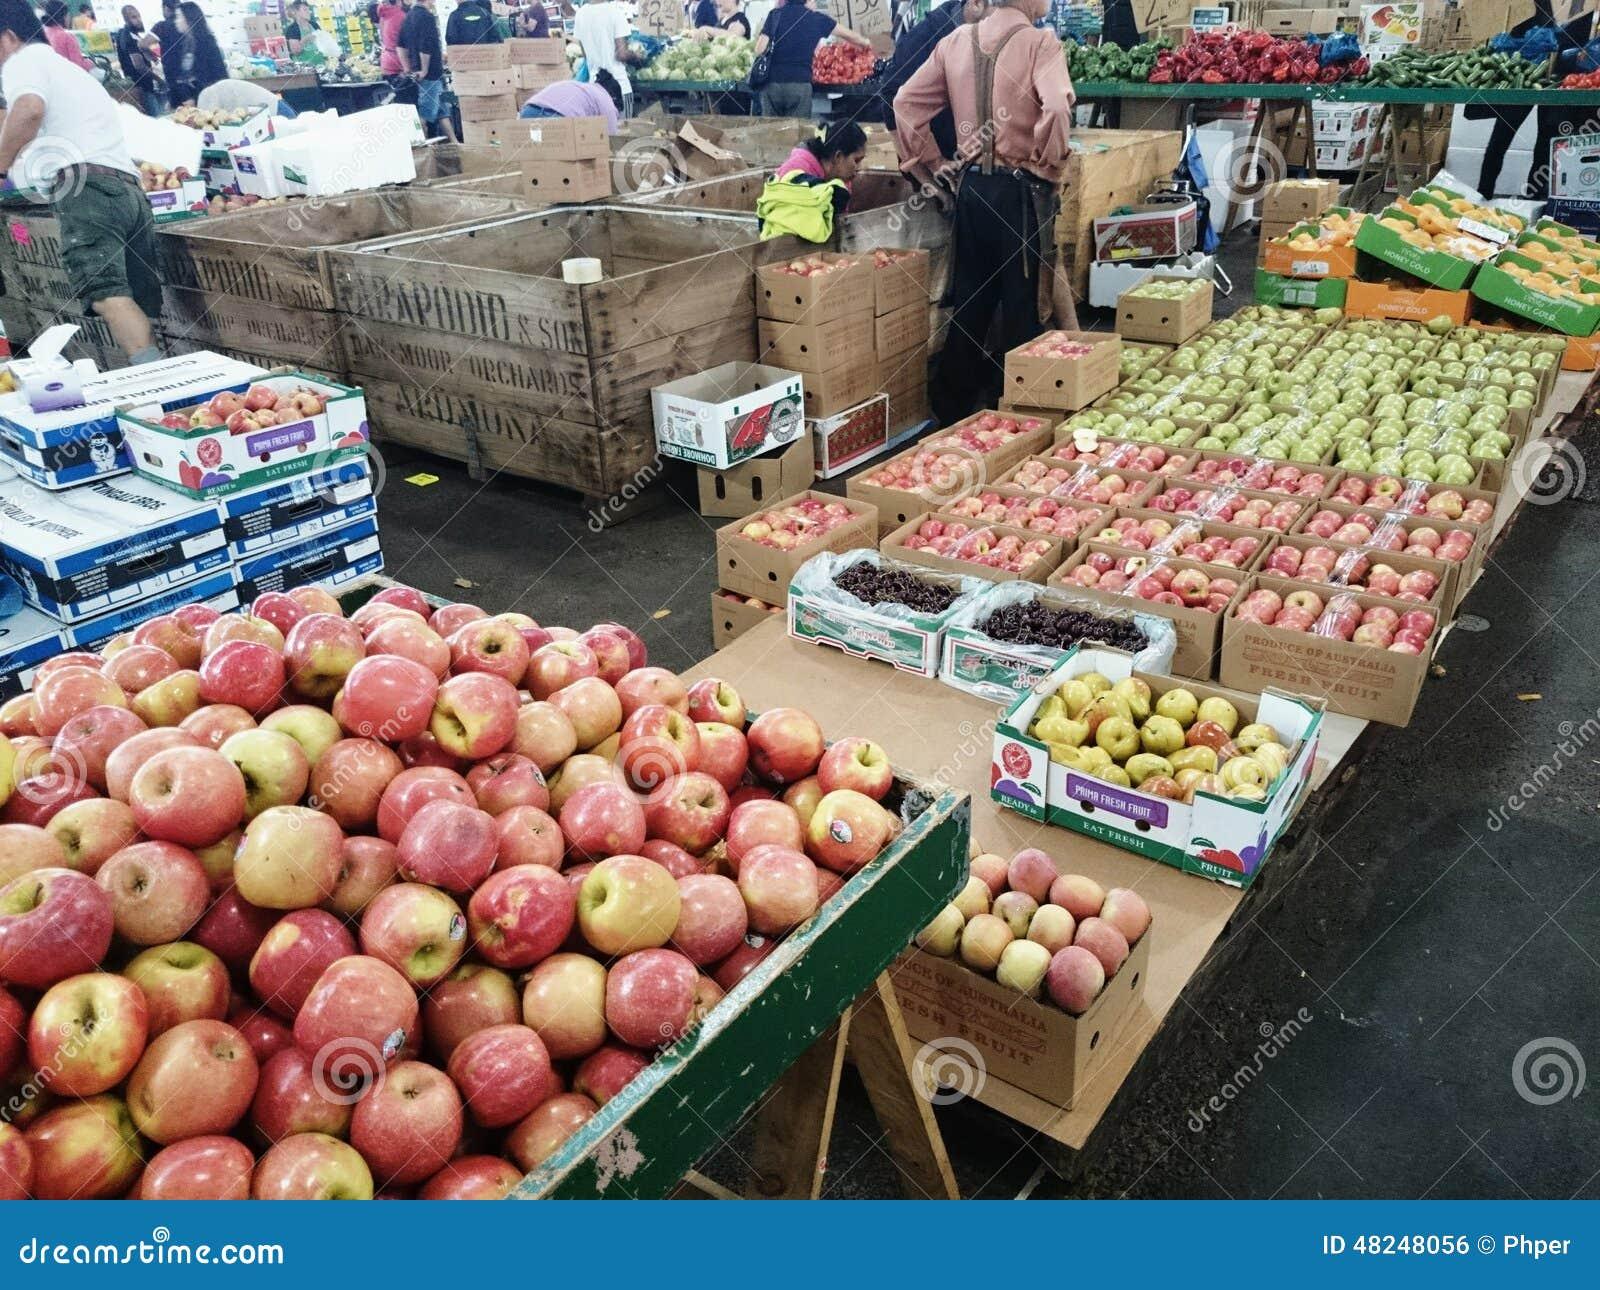 sydney fruit and veg market report - photo#13